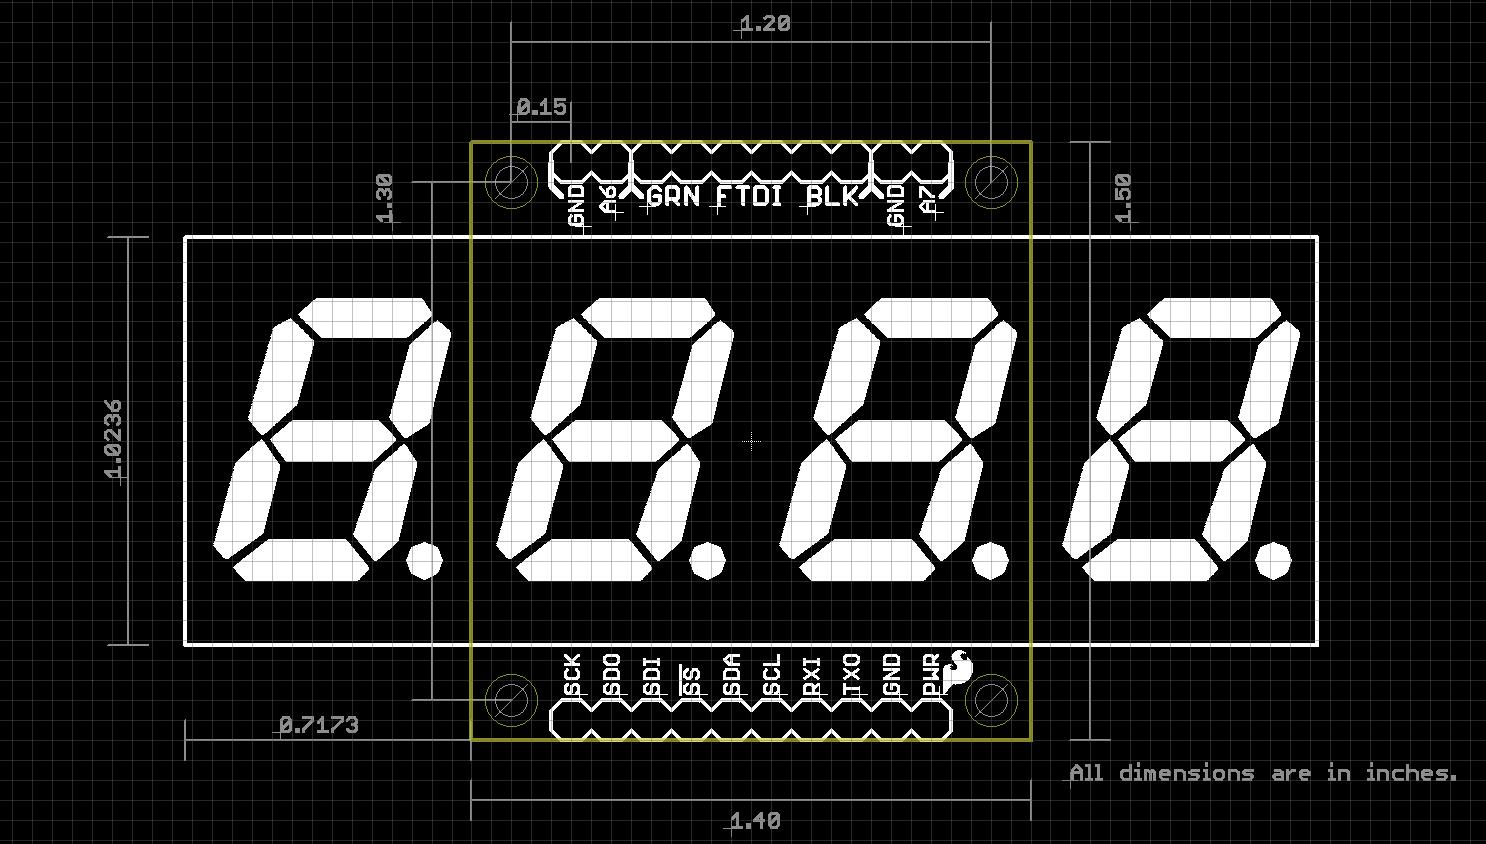 Sparkfun Opensegment Serial Display 20mm Red Com 11644 Circuit Diagram For The 7segment